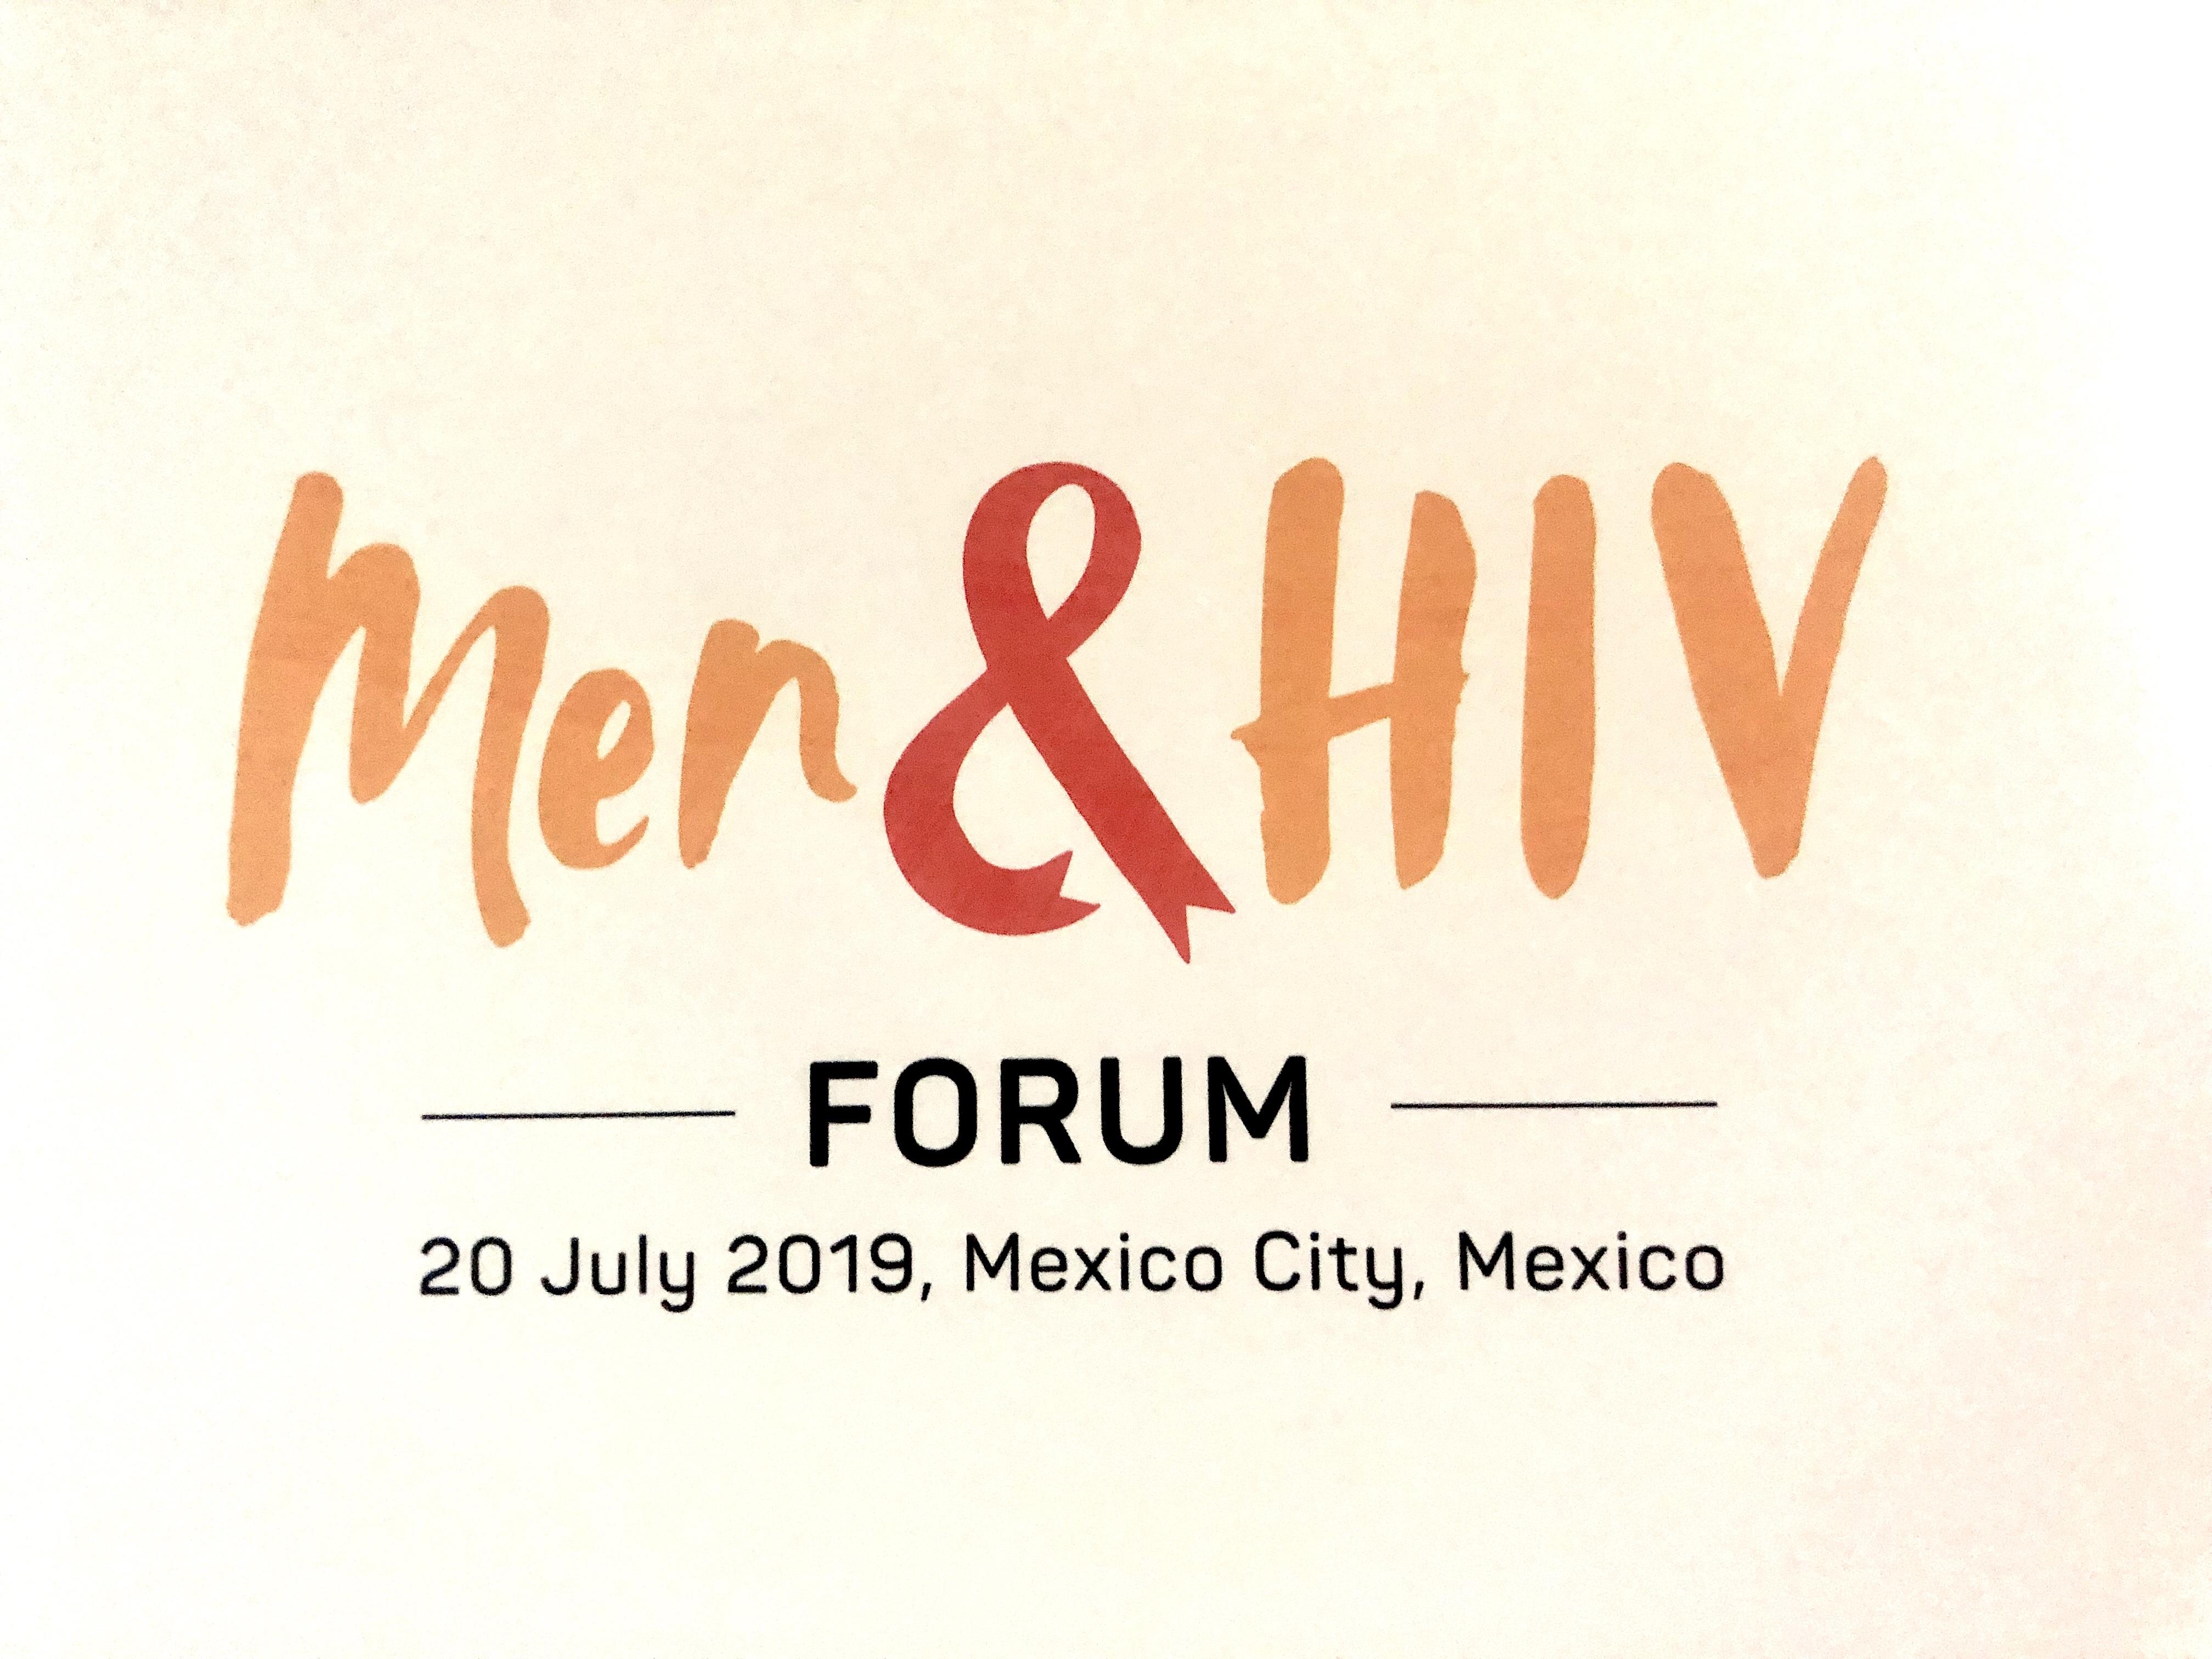 Men & HIV